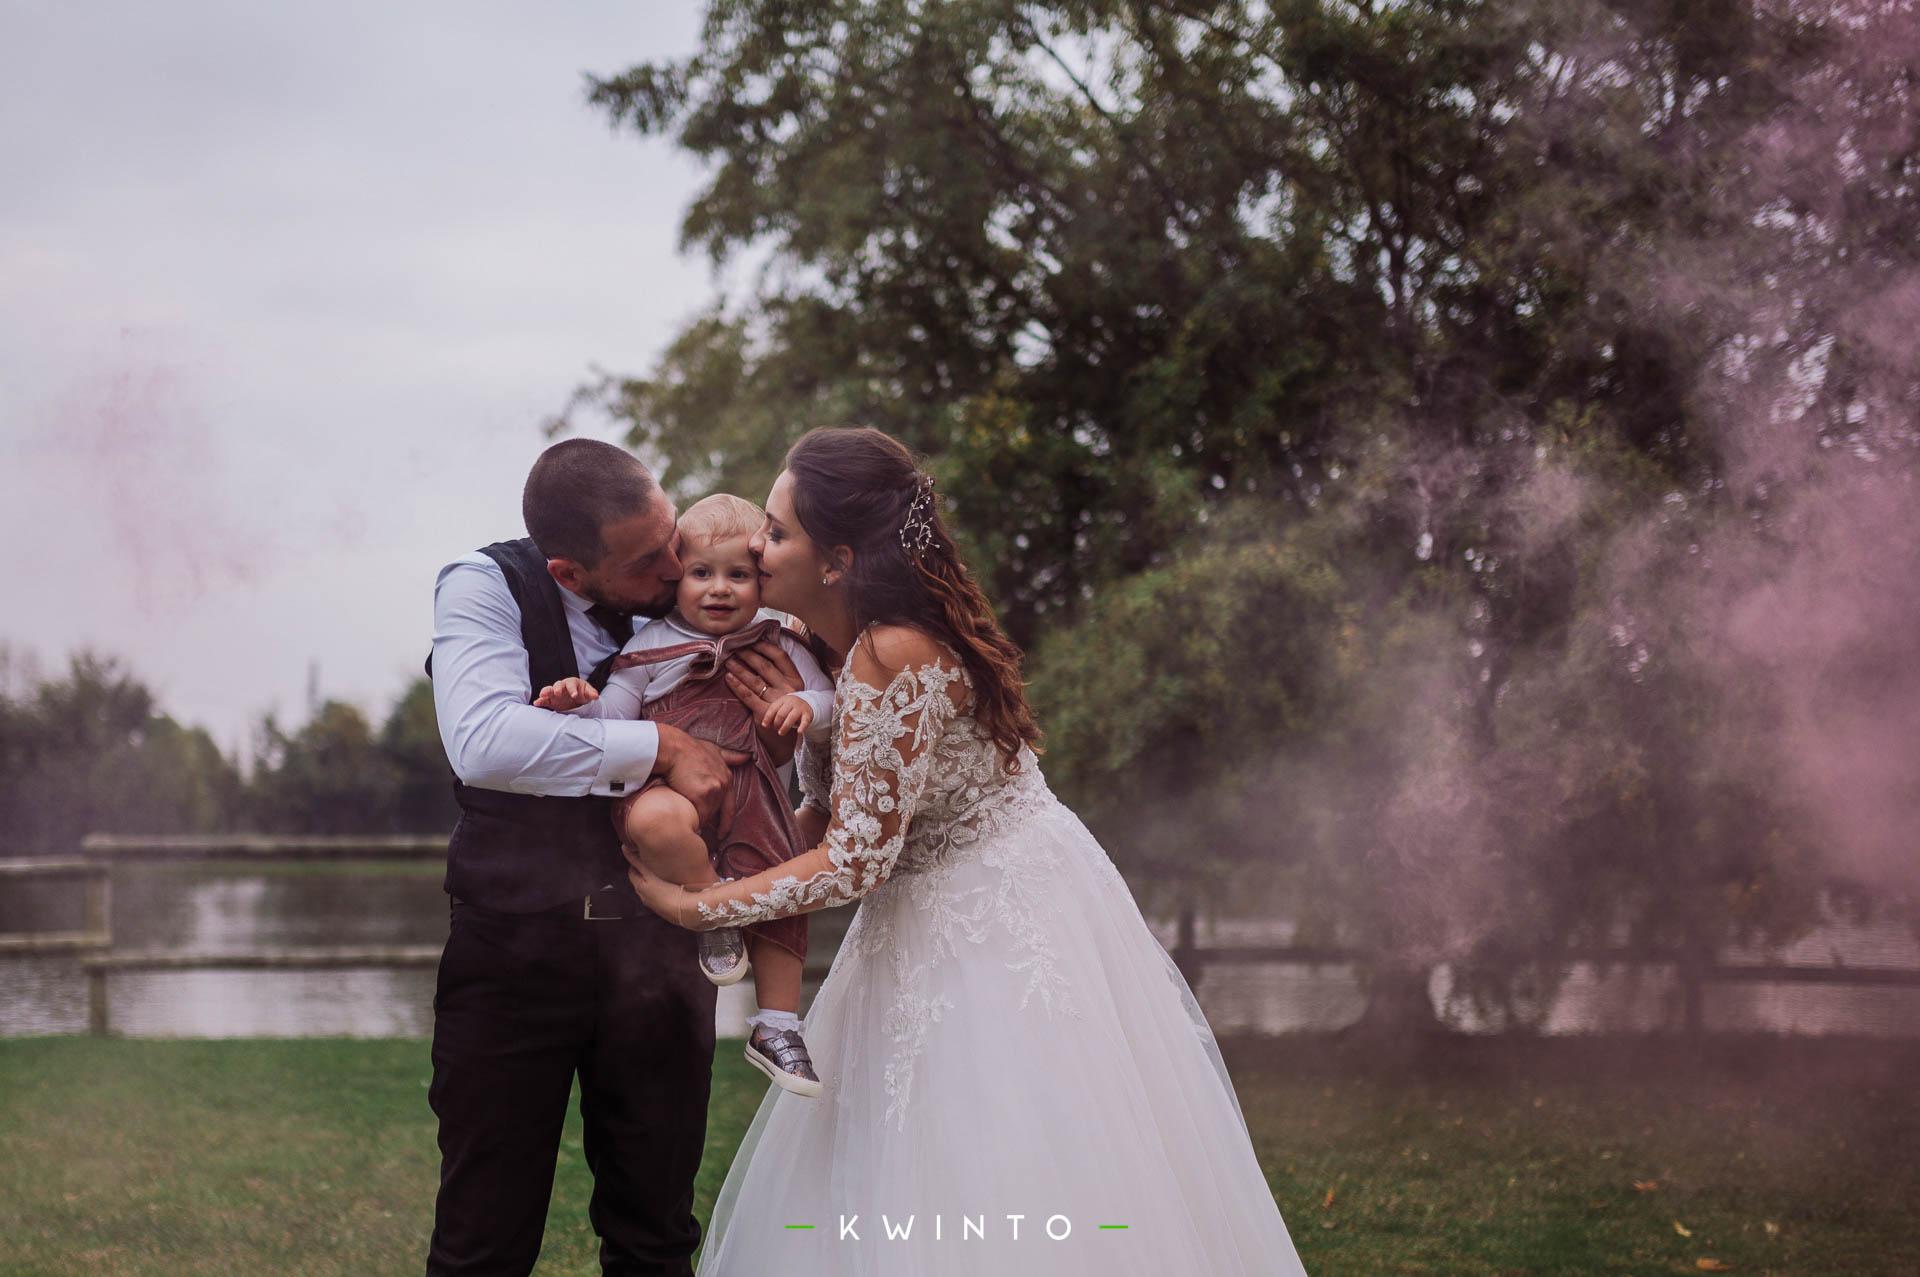 Matrimonio Silvia e Fabio - Un nastrino a pois - Wedding planner Venezia